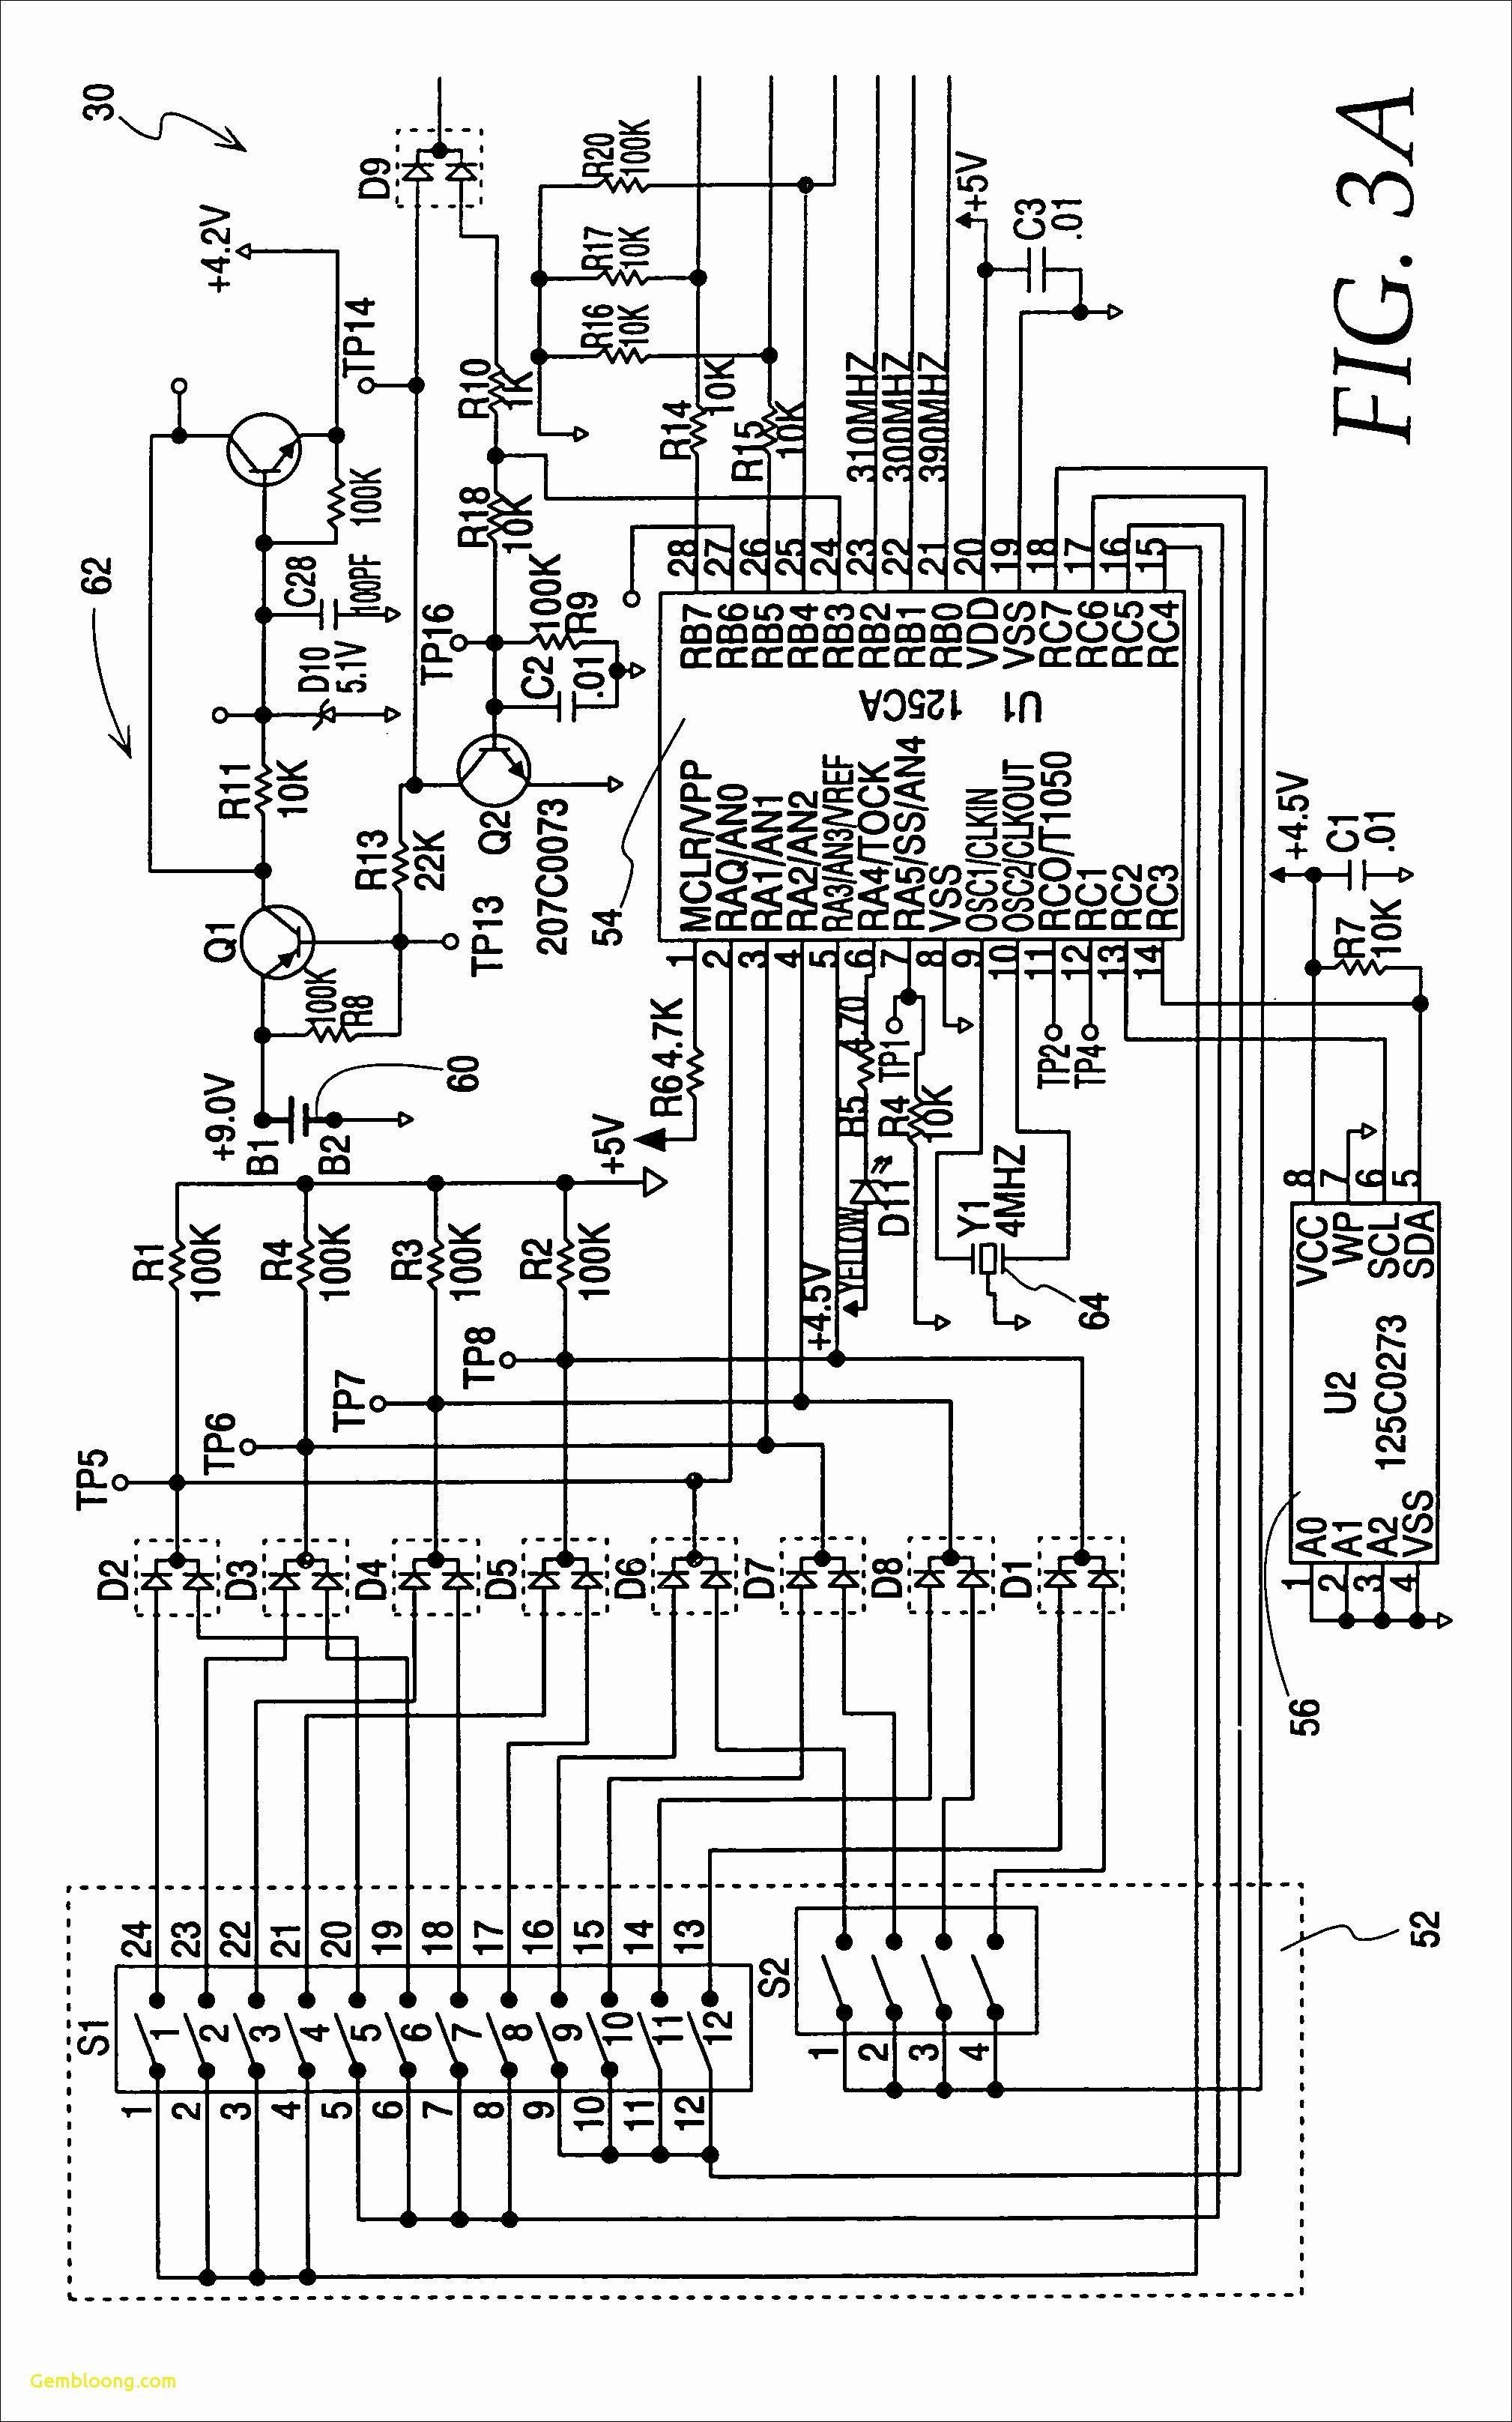 bmw e60 instrument cluster wiring diagram unique wiring diagram for domestic consumer unit diagram  wiring diagram for domestic consumer